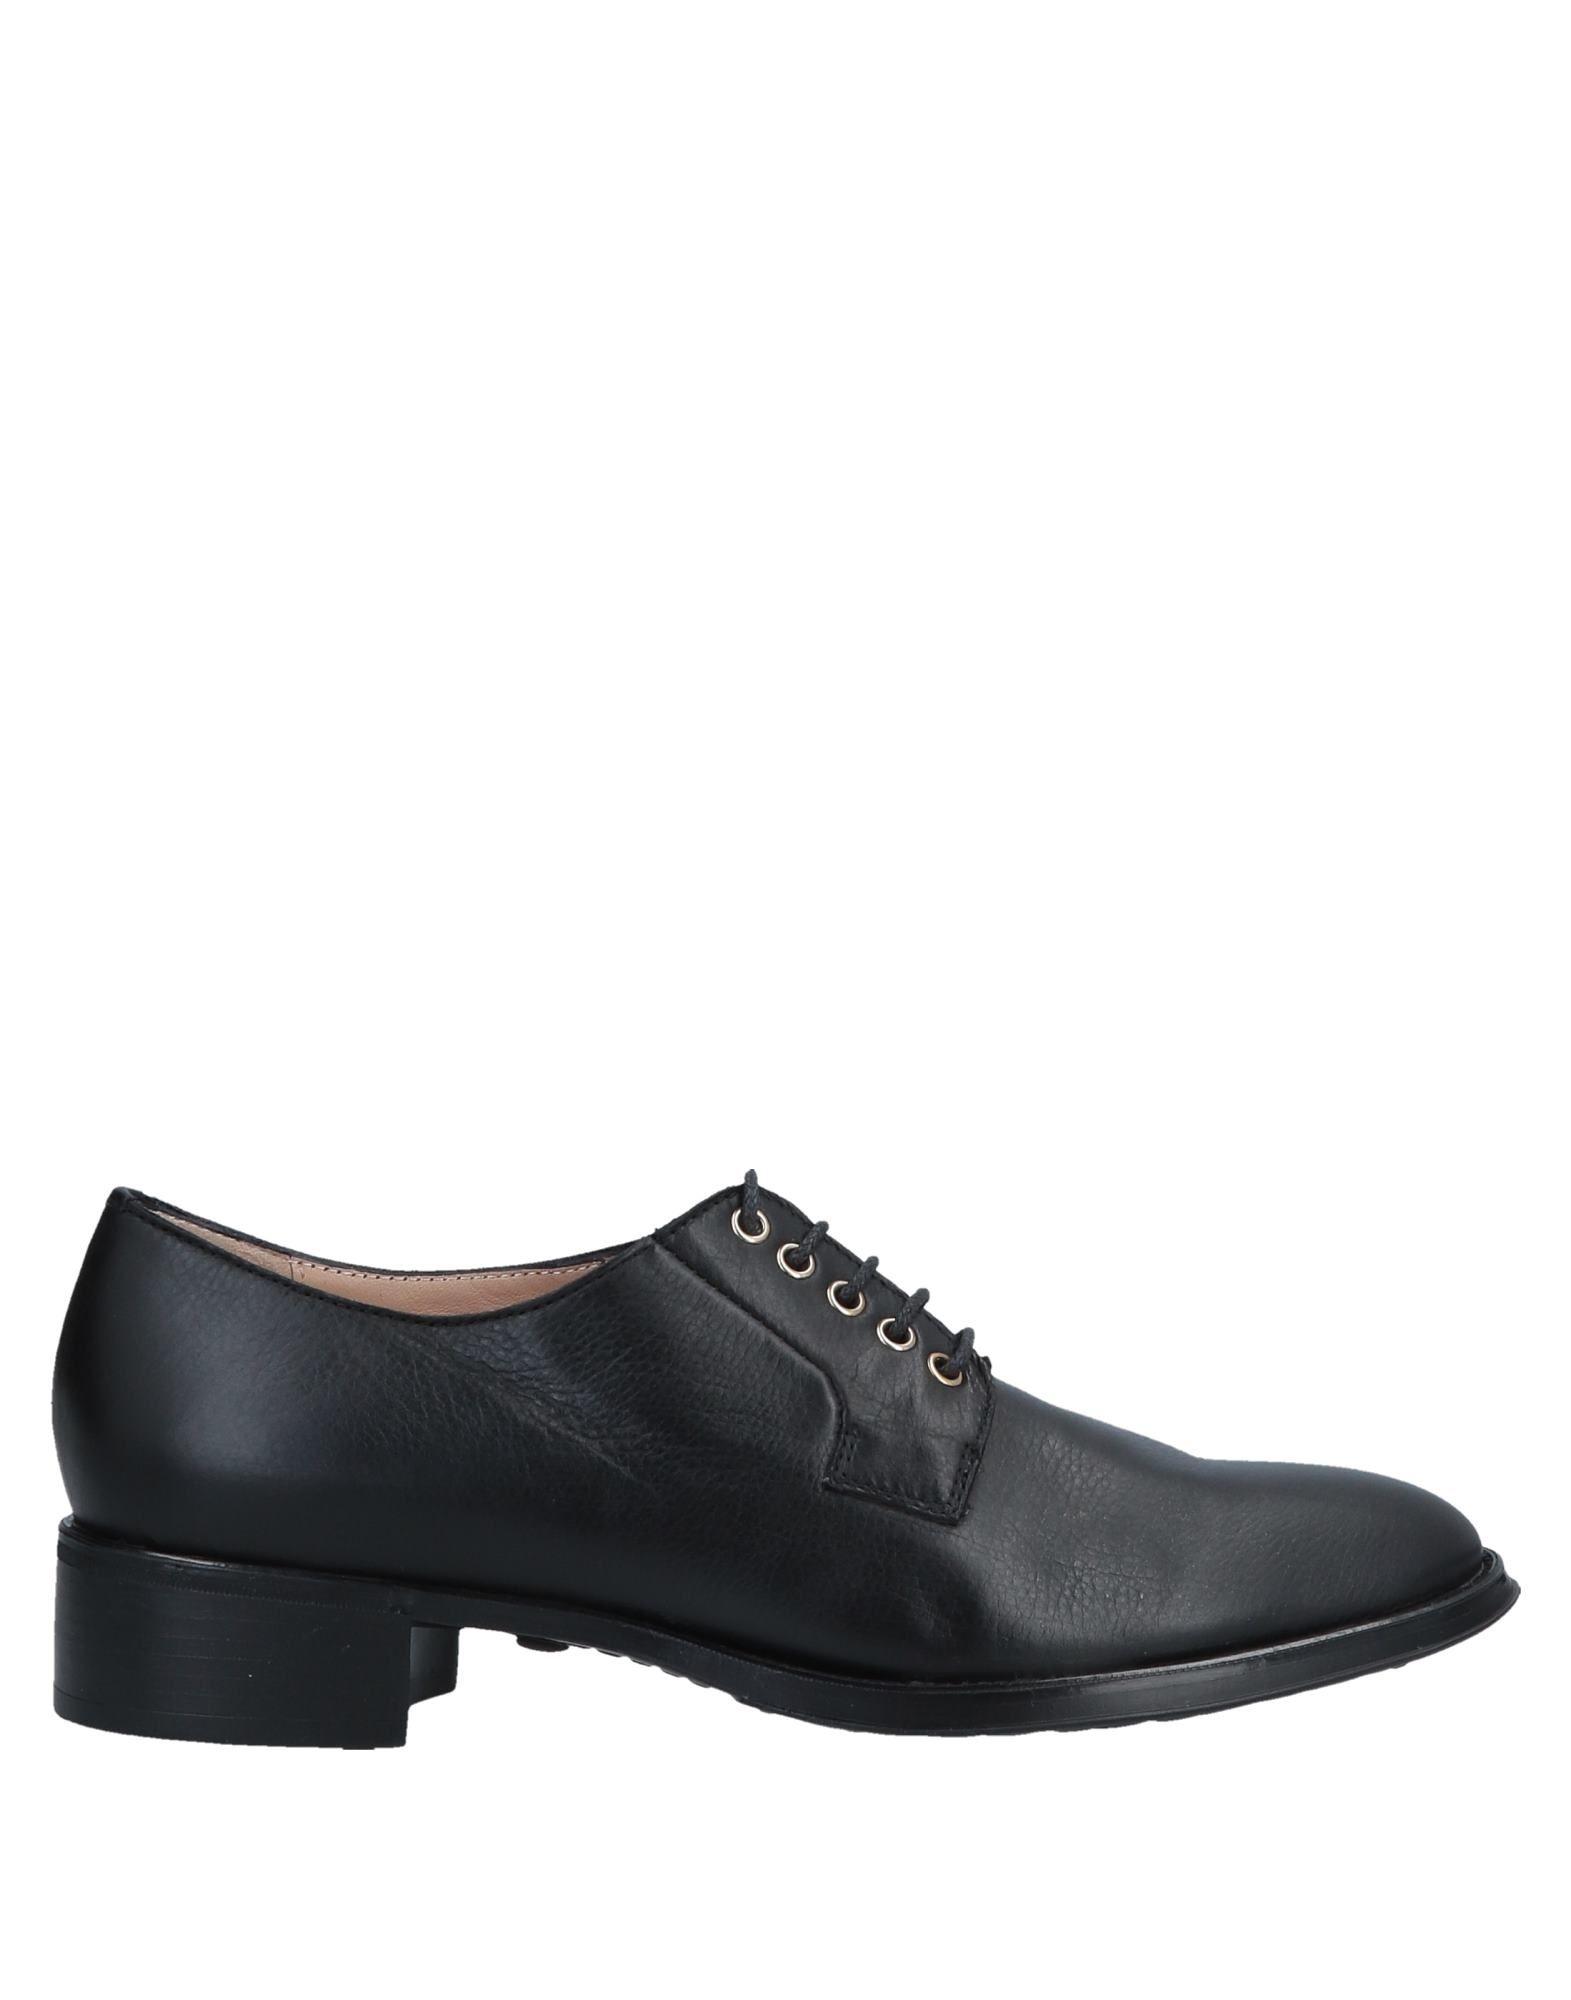 Фото - F.LLI BRUGLIA Обувь на шнурках обувь на высокой платформе dkny